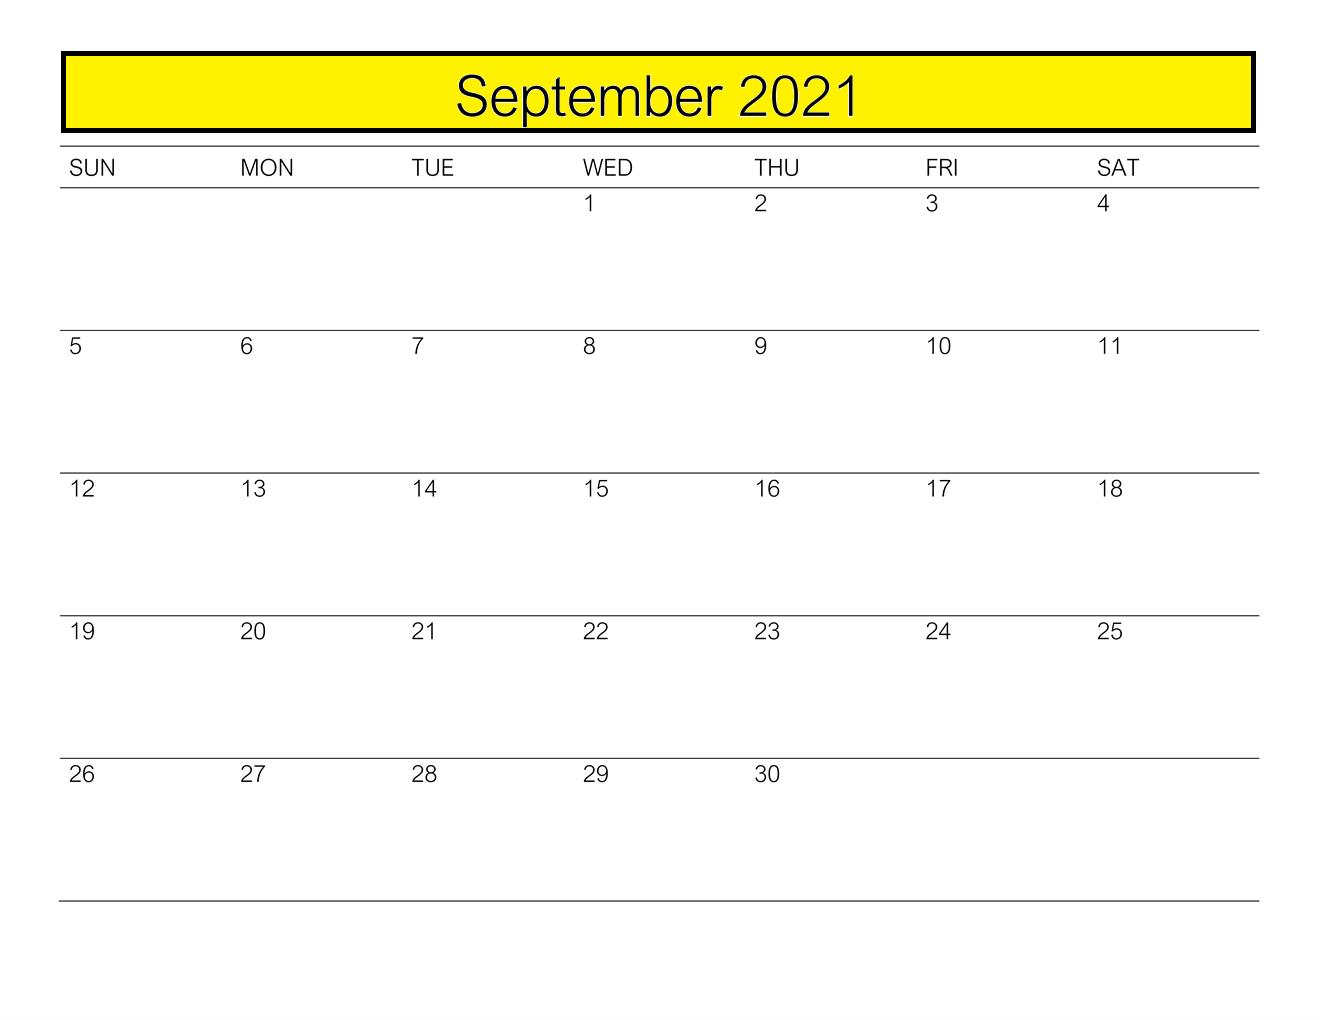 September 2021 Calendar With Holidays India